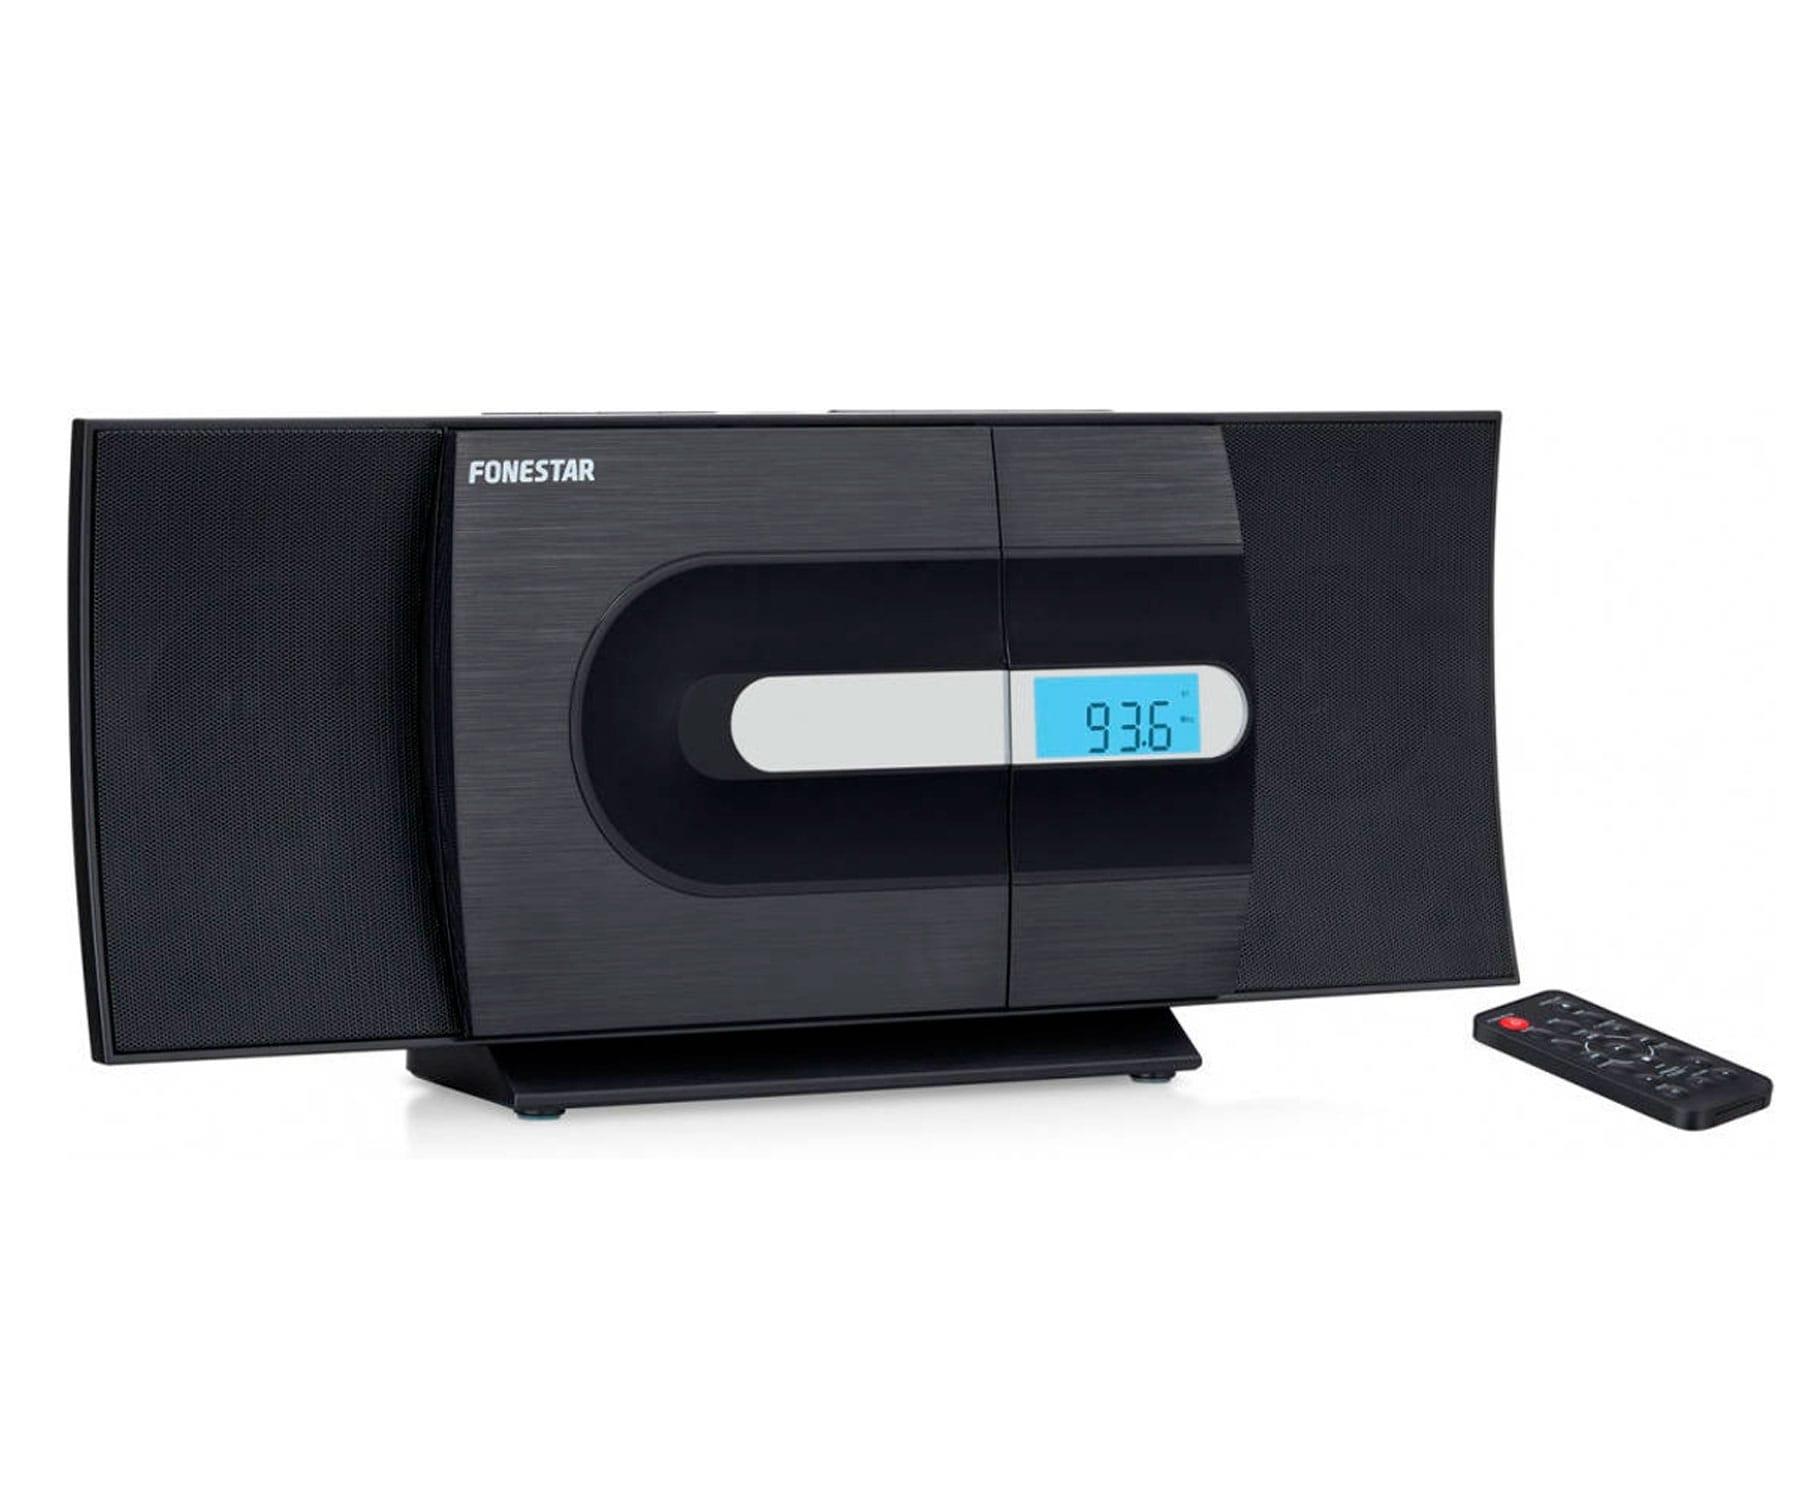 Fonestar CURVE Microcadena Hi-FI/CD/USB/MP3/FM